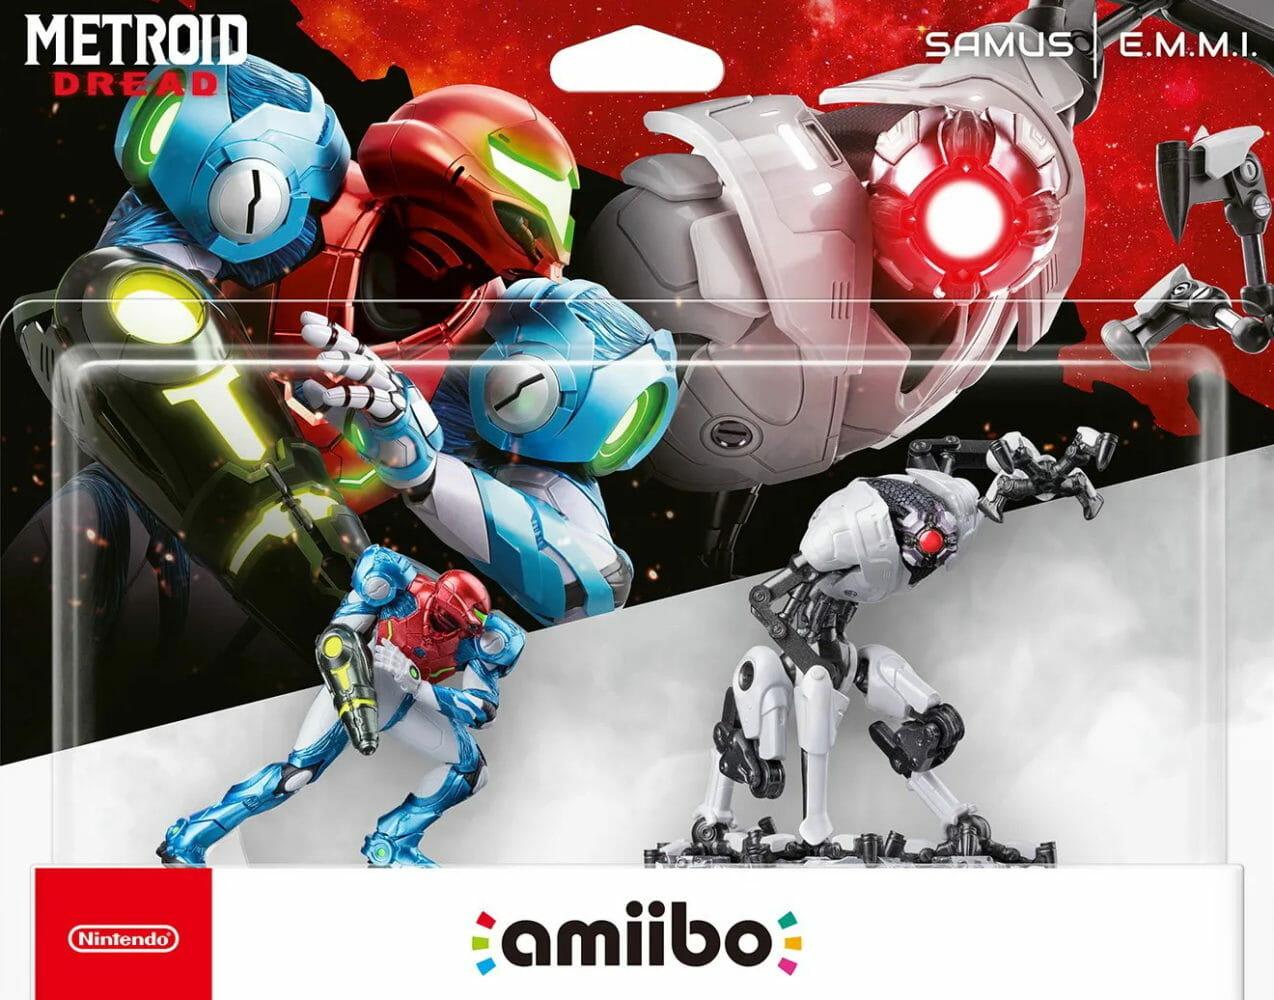 amiibo Metroid Dread Samus Aran E.M.M.I.